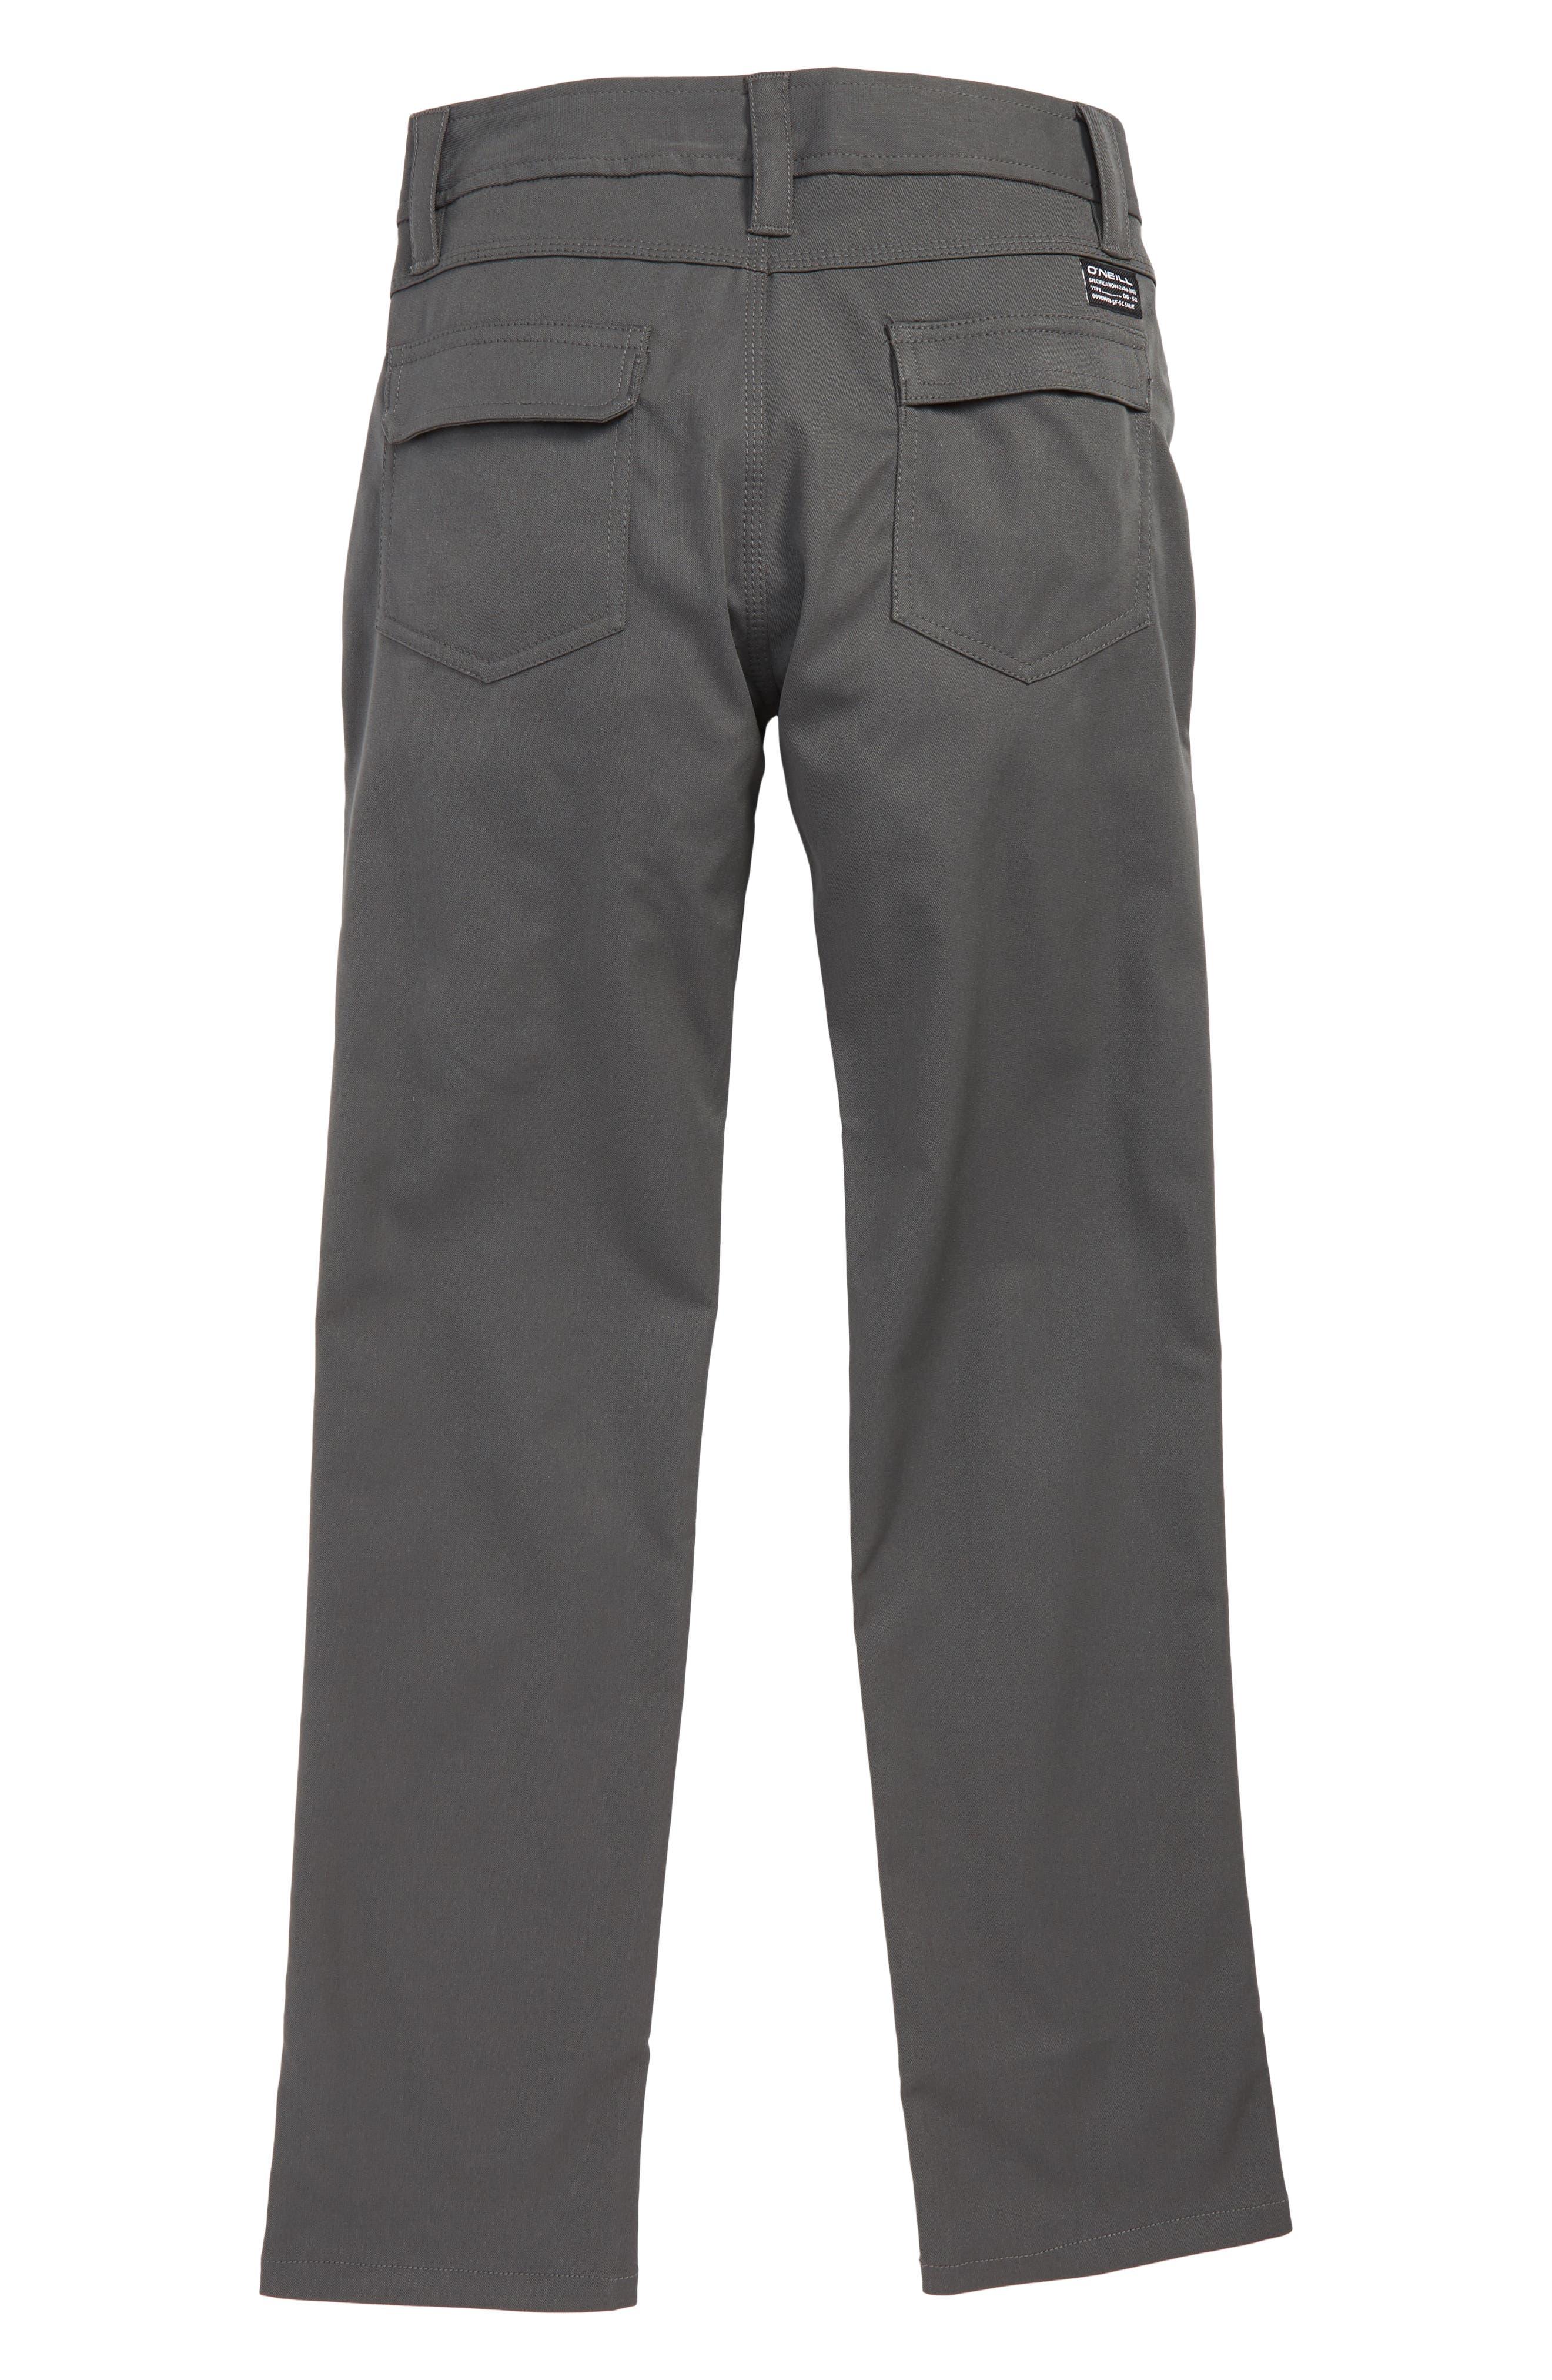 Redlands Hybrid Pants,                             Alternate thumbnail 2, color,                             020